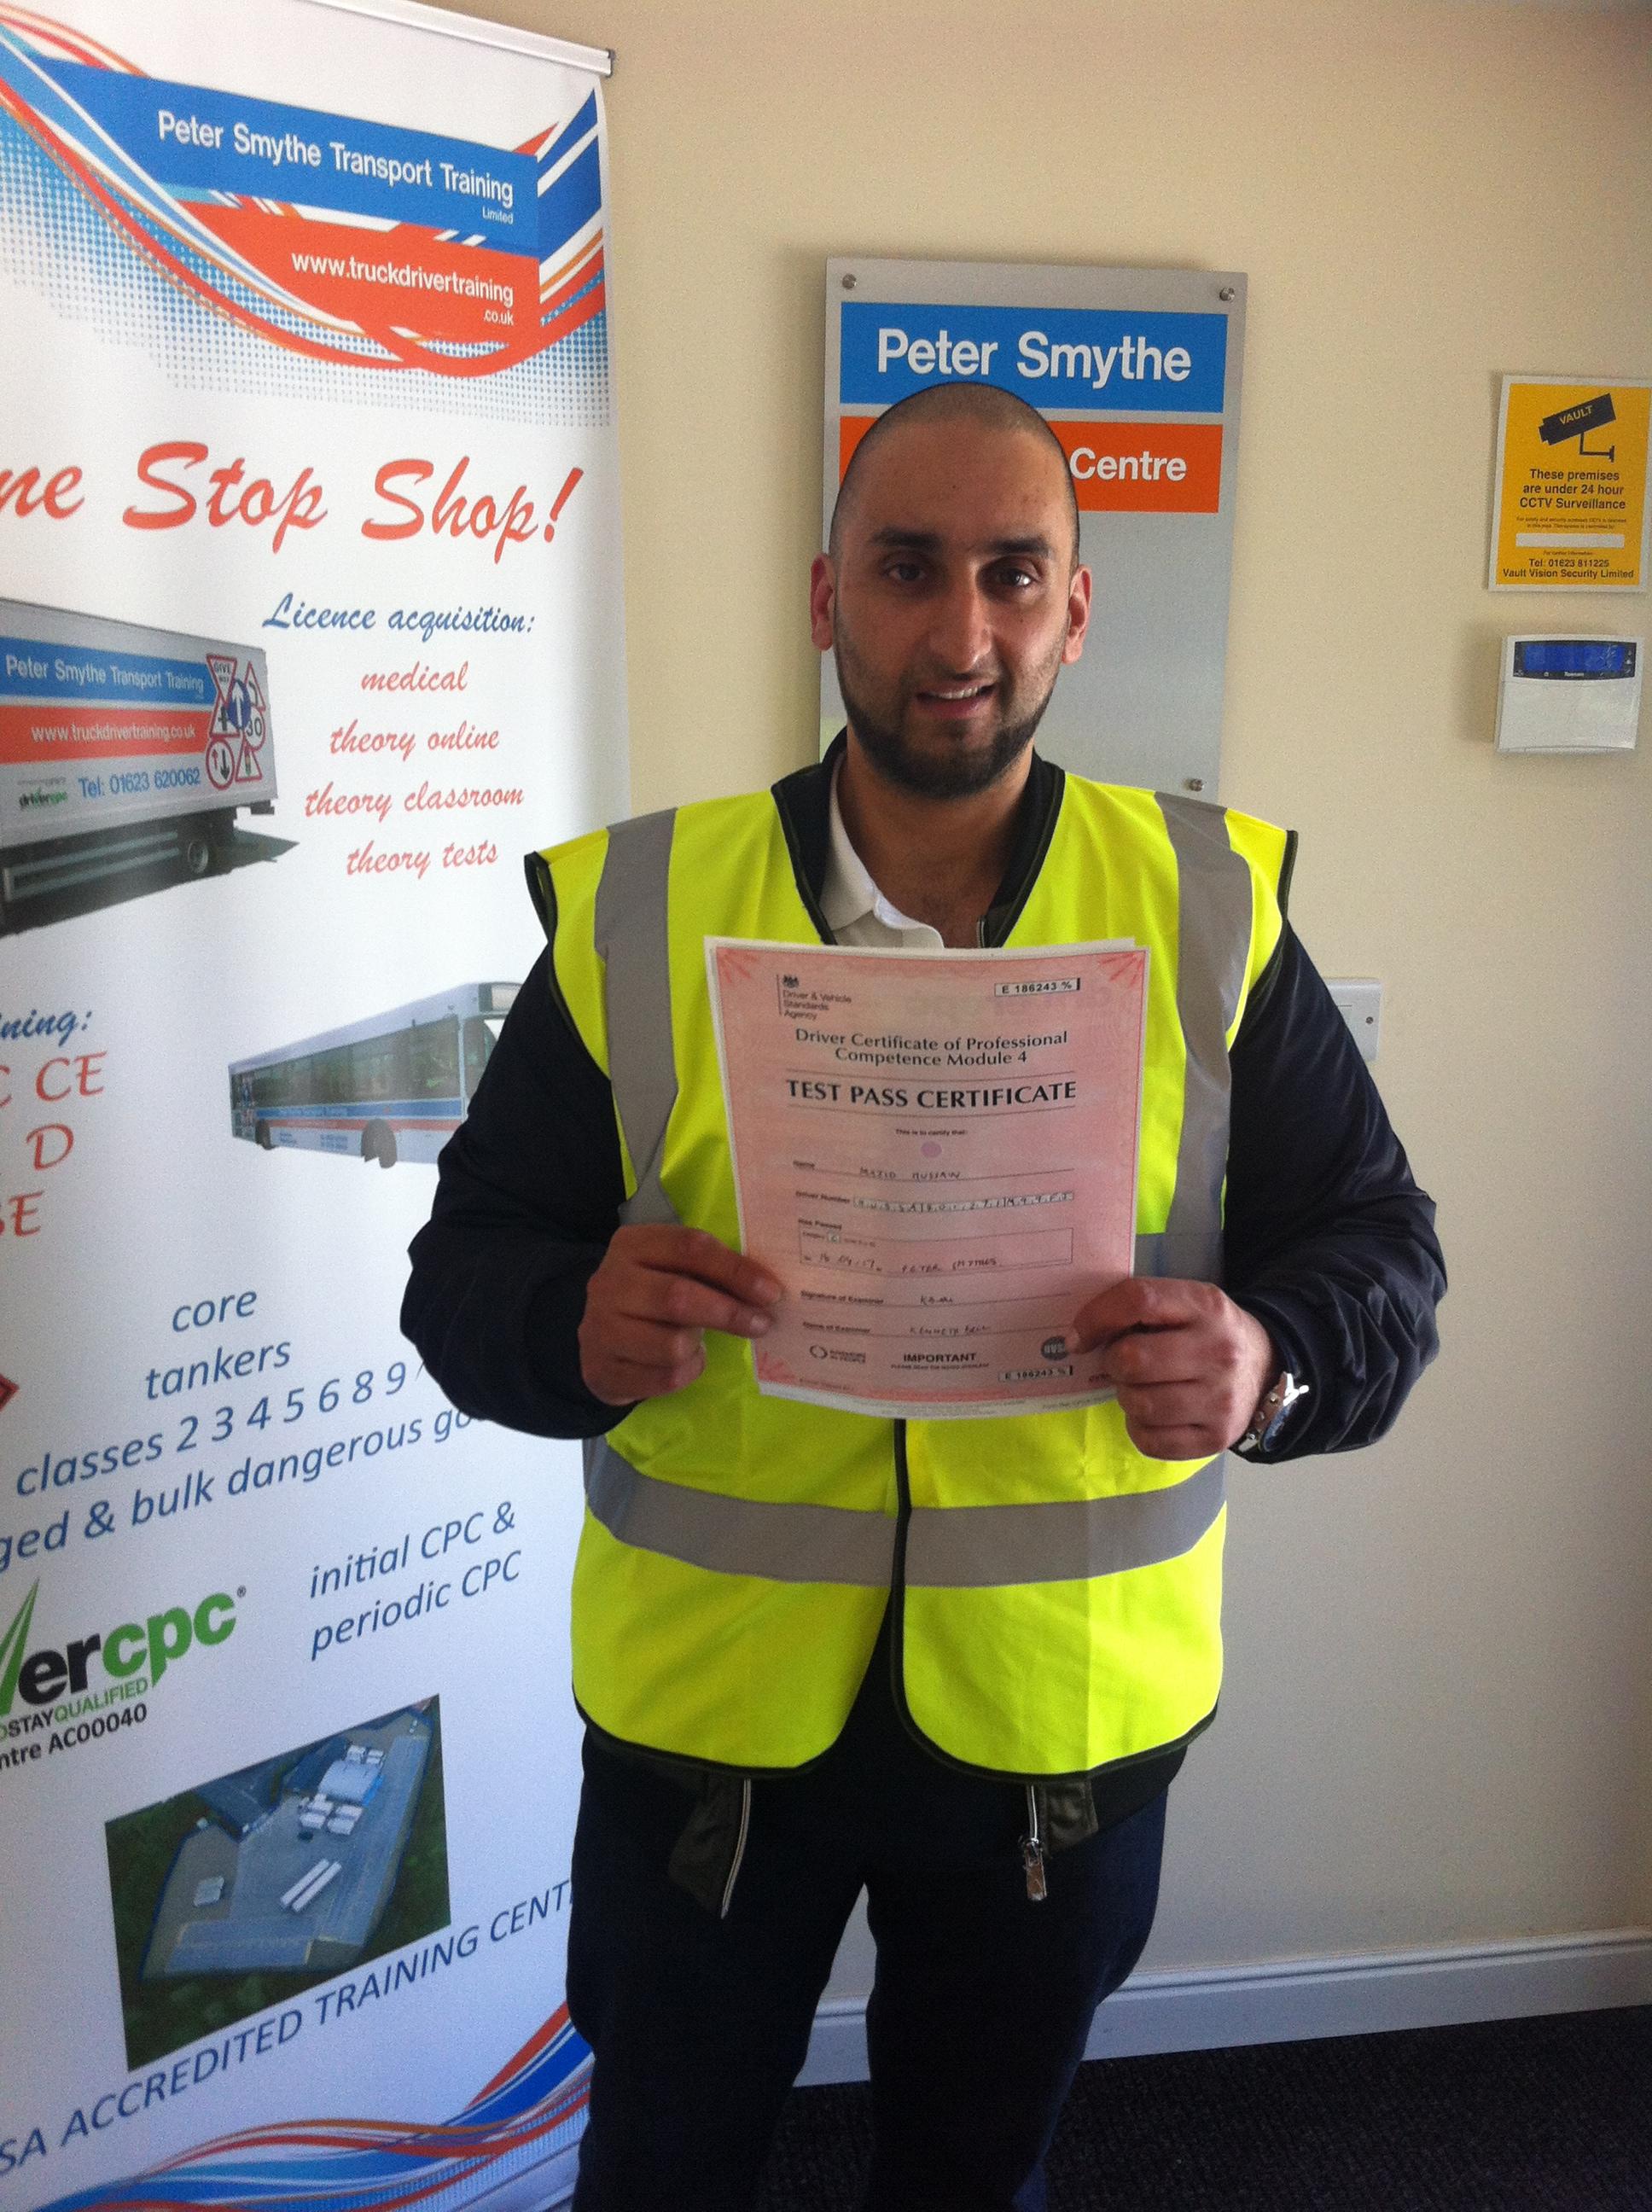 Majid Hussain from Bradford PASSED CPC MOD 4 #Ipassedwithpstt